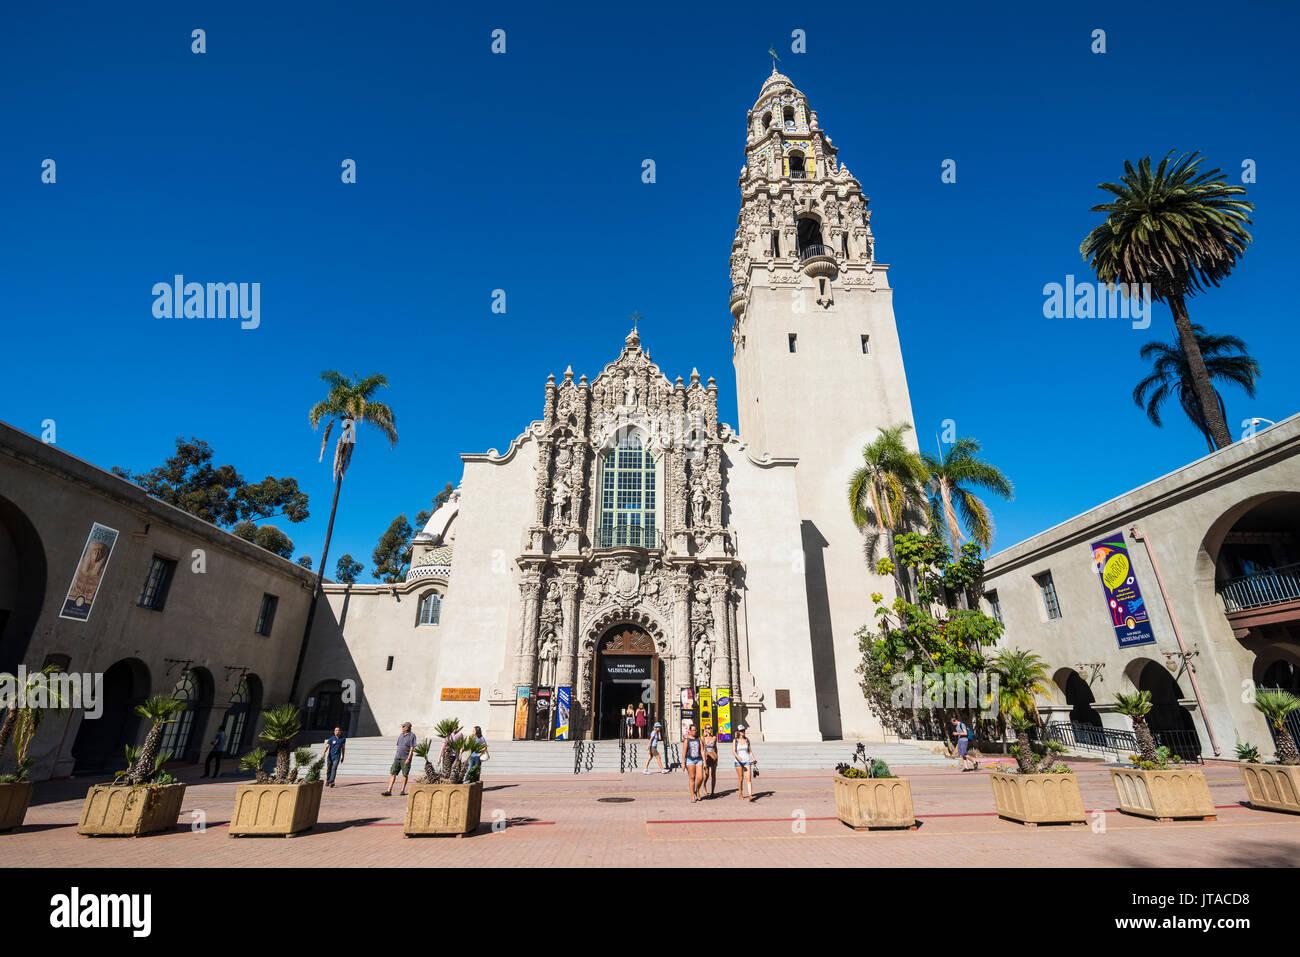 San Diego Museum of Man, Balboa Park, San Diego, California, United States of America, North America - Stock Image